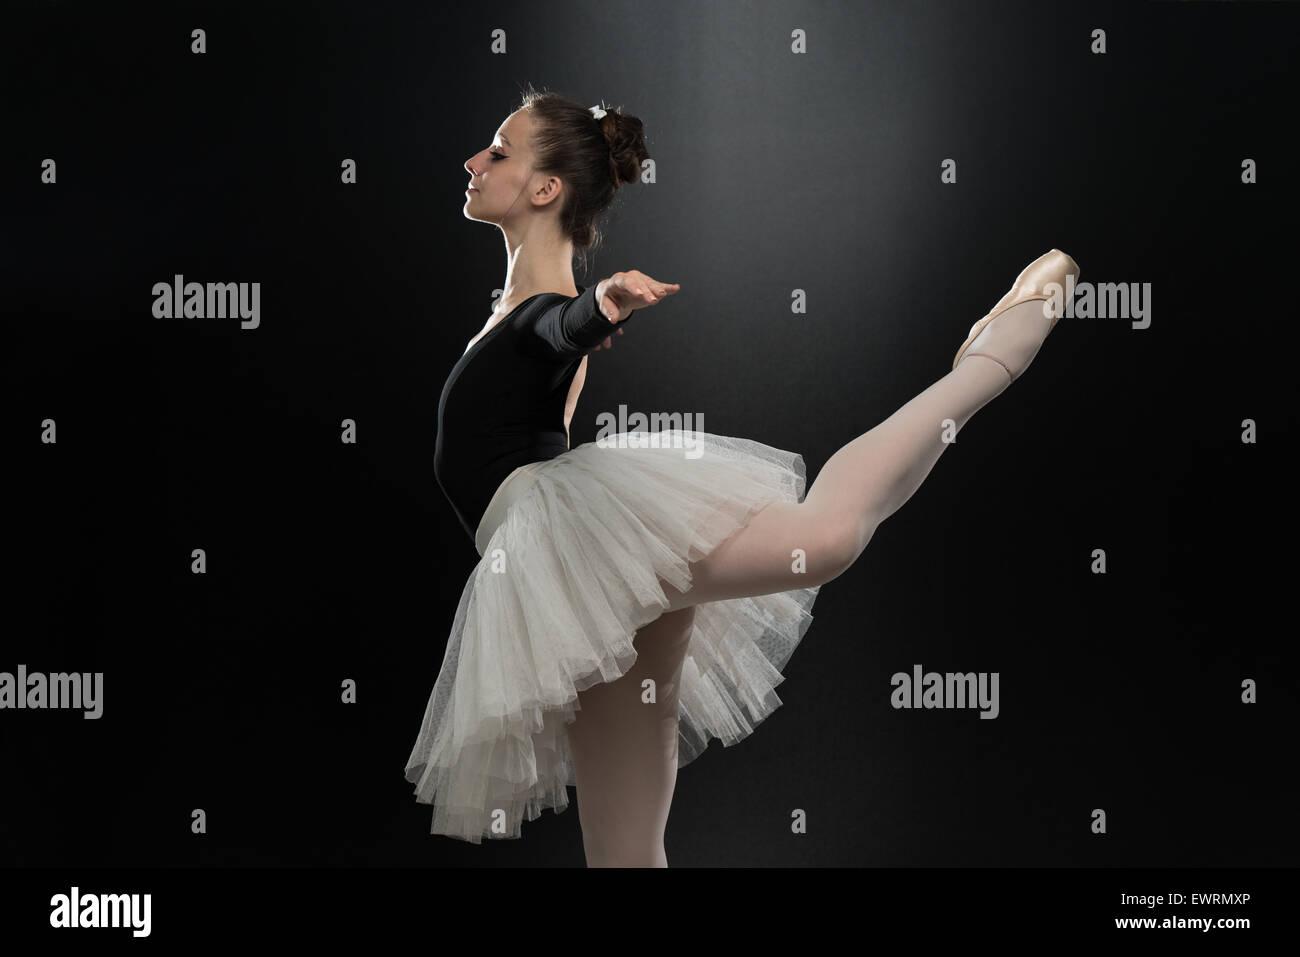 Mujer hermosa bailarina de ballet sobre un fondo negro